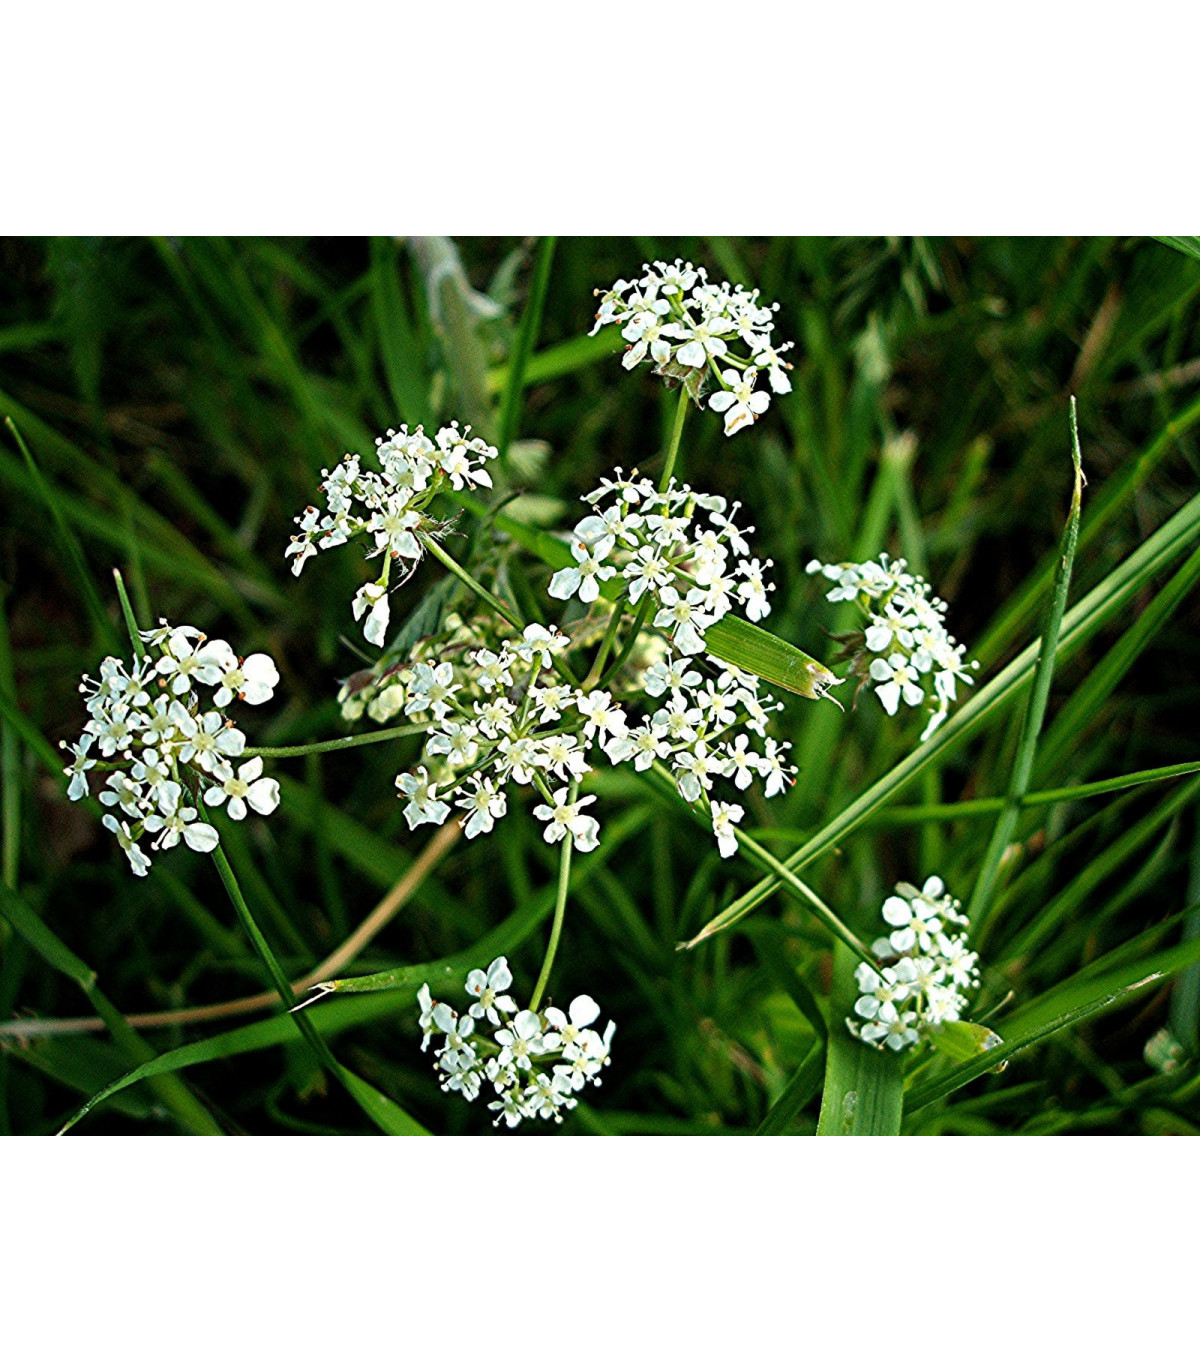 BIO semena kerblík setý - prodej bio semen - Anthriscus - prodej bio semen cerefolium - 0,8 g